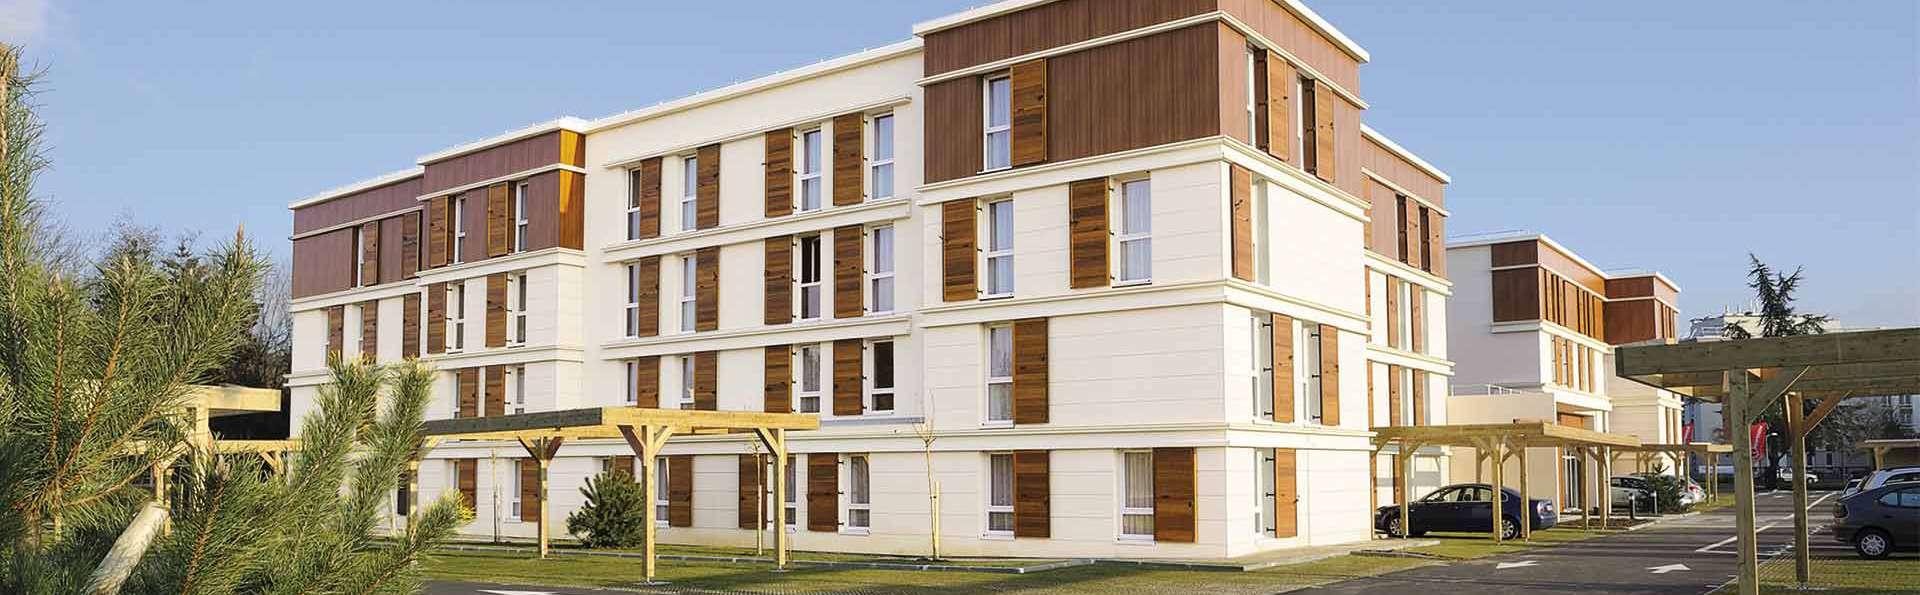 Residhome Paris Guyancourt - EDIT_front1.jpg